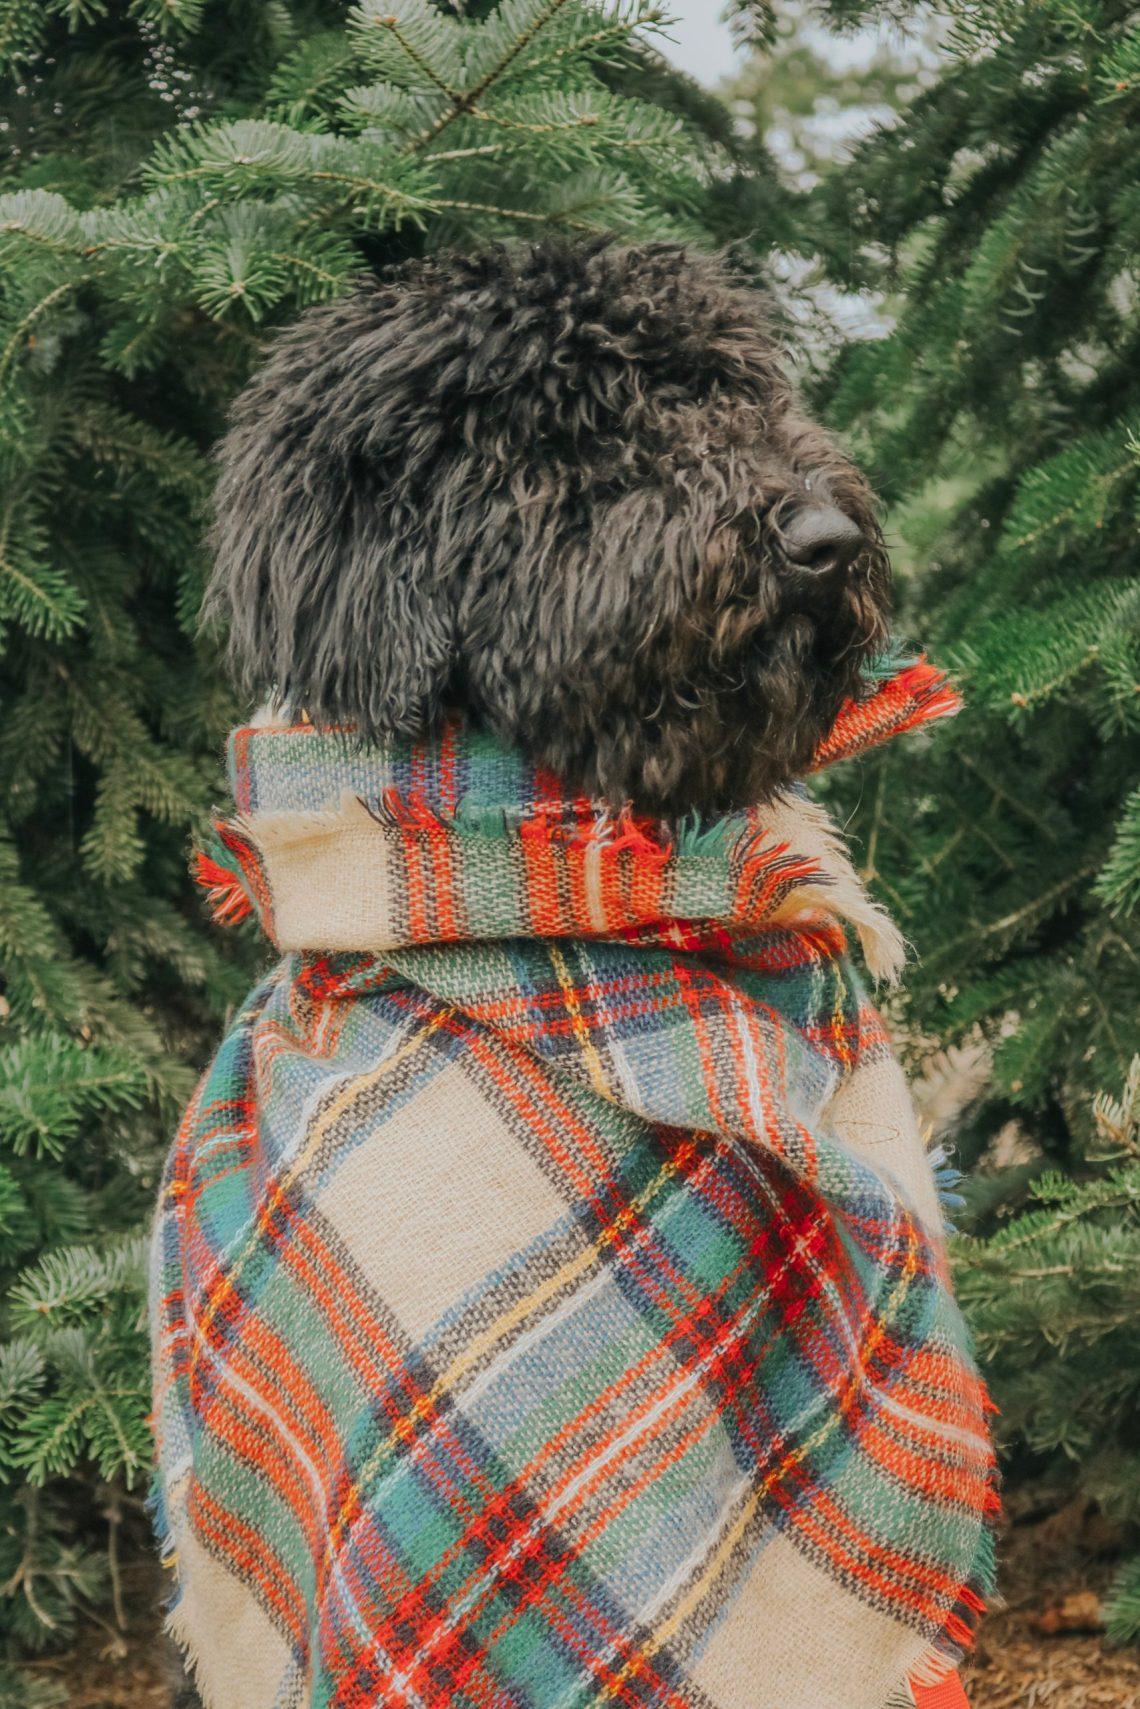 Christmas, Christmas Tree Farm, Christmas tree, labradoodle, puppy, labradoodle puppy, puppy's first christmas, dog photography, Christmas photos, fashion, fashion blogger, lifestyle blogger, The Urban Darling.